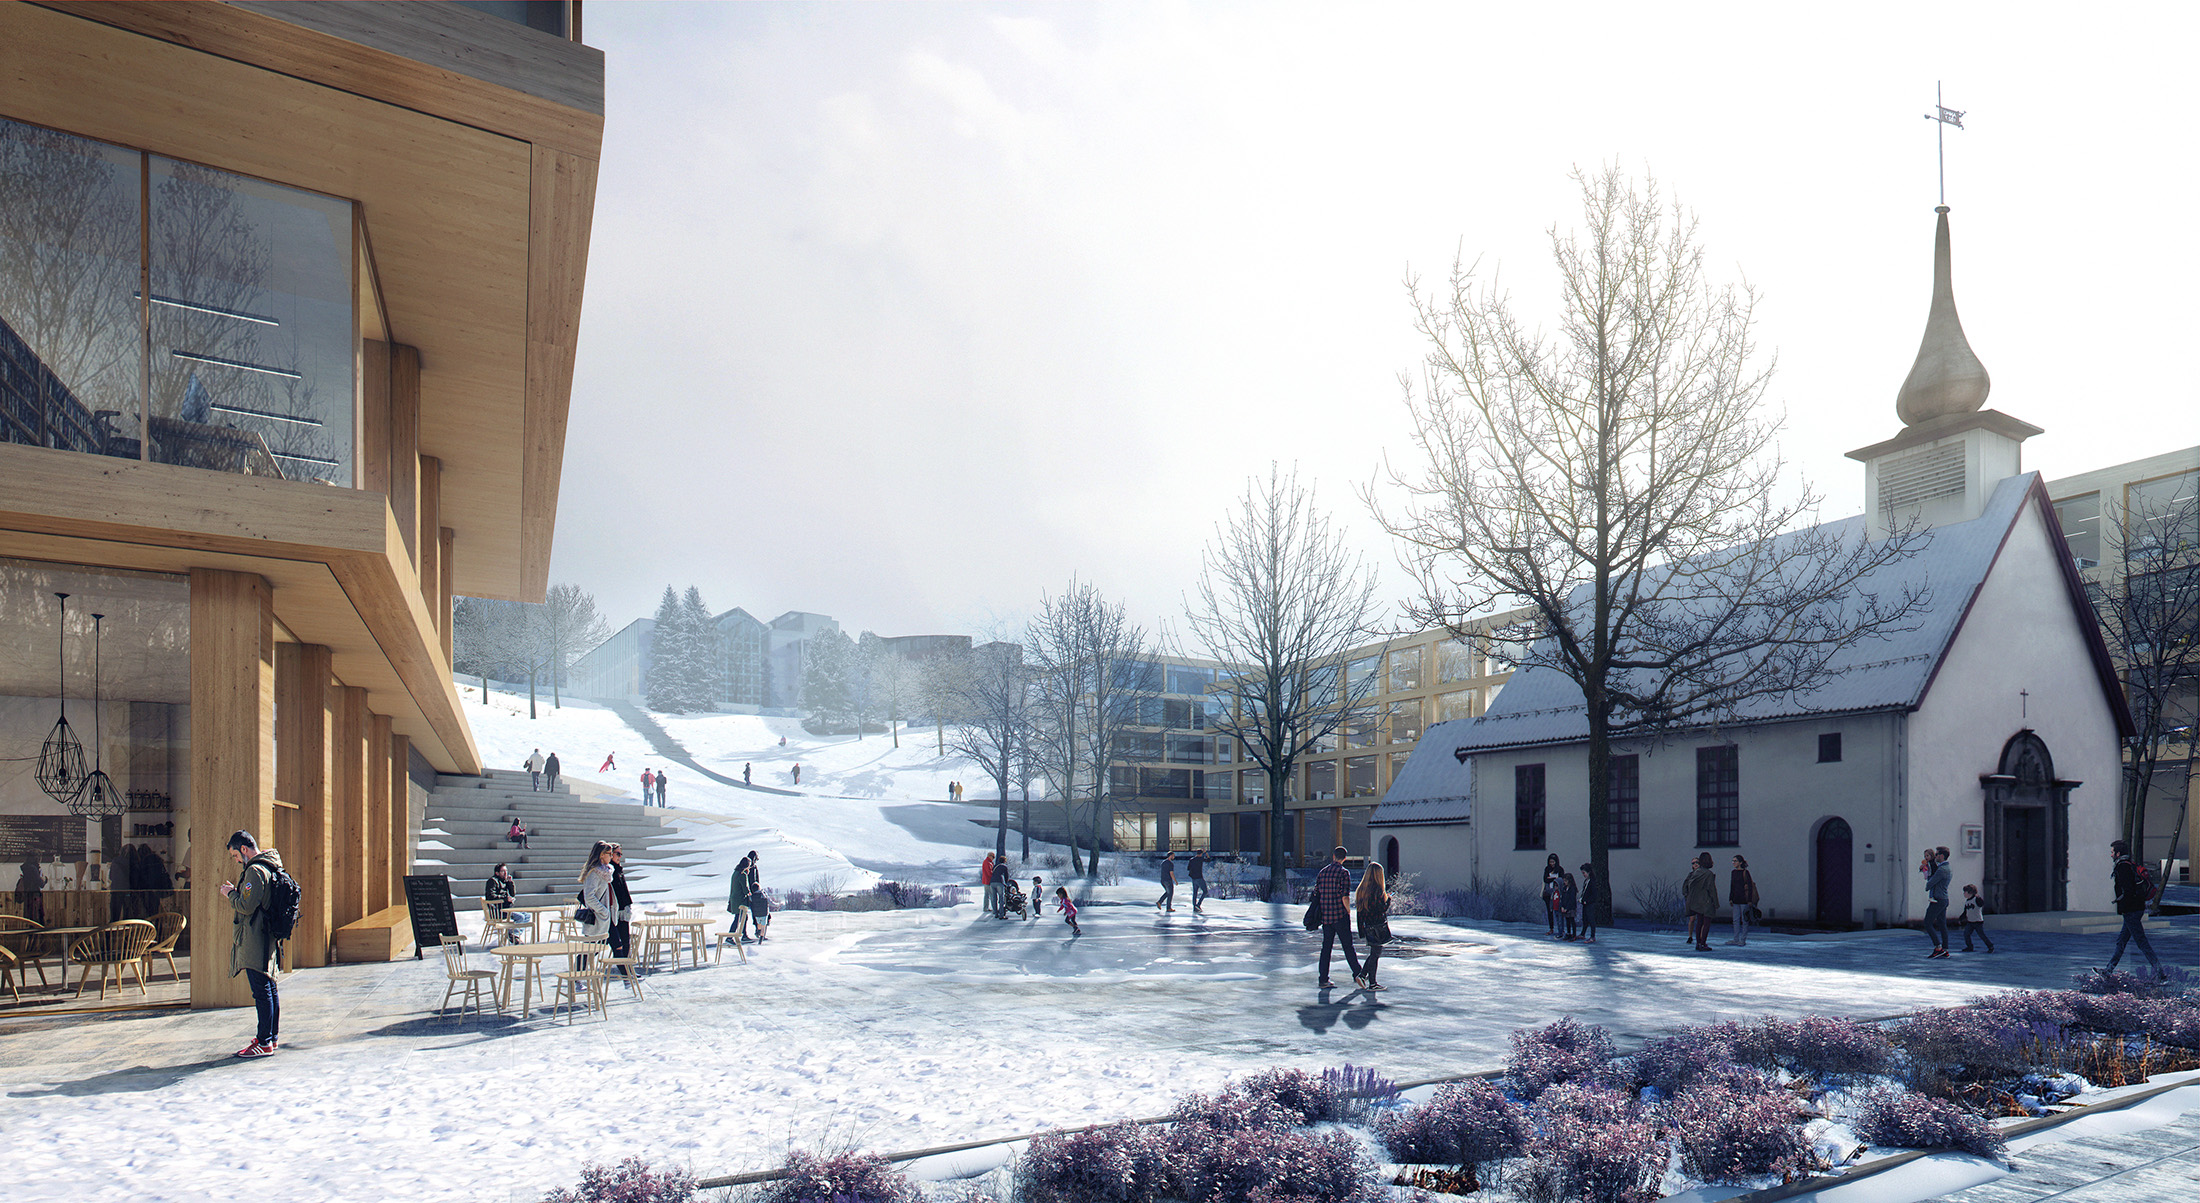 Koht, Trondheim University, Norway, 2017